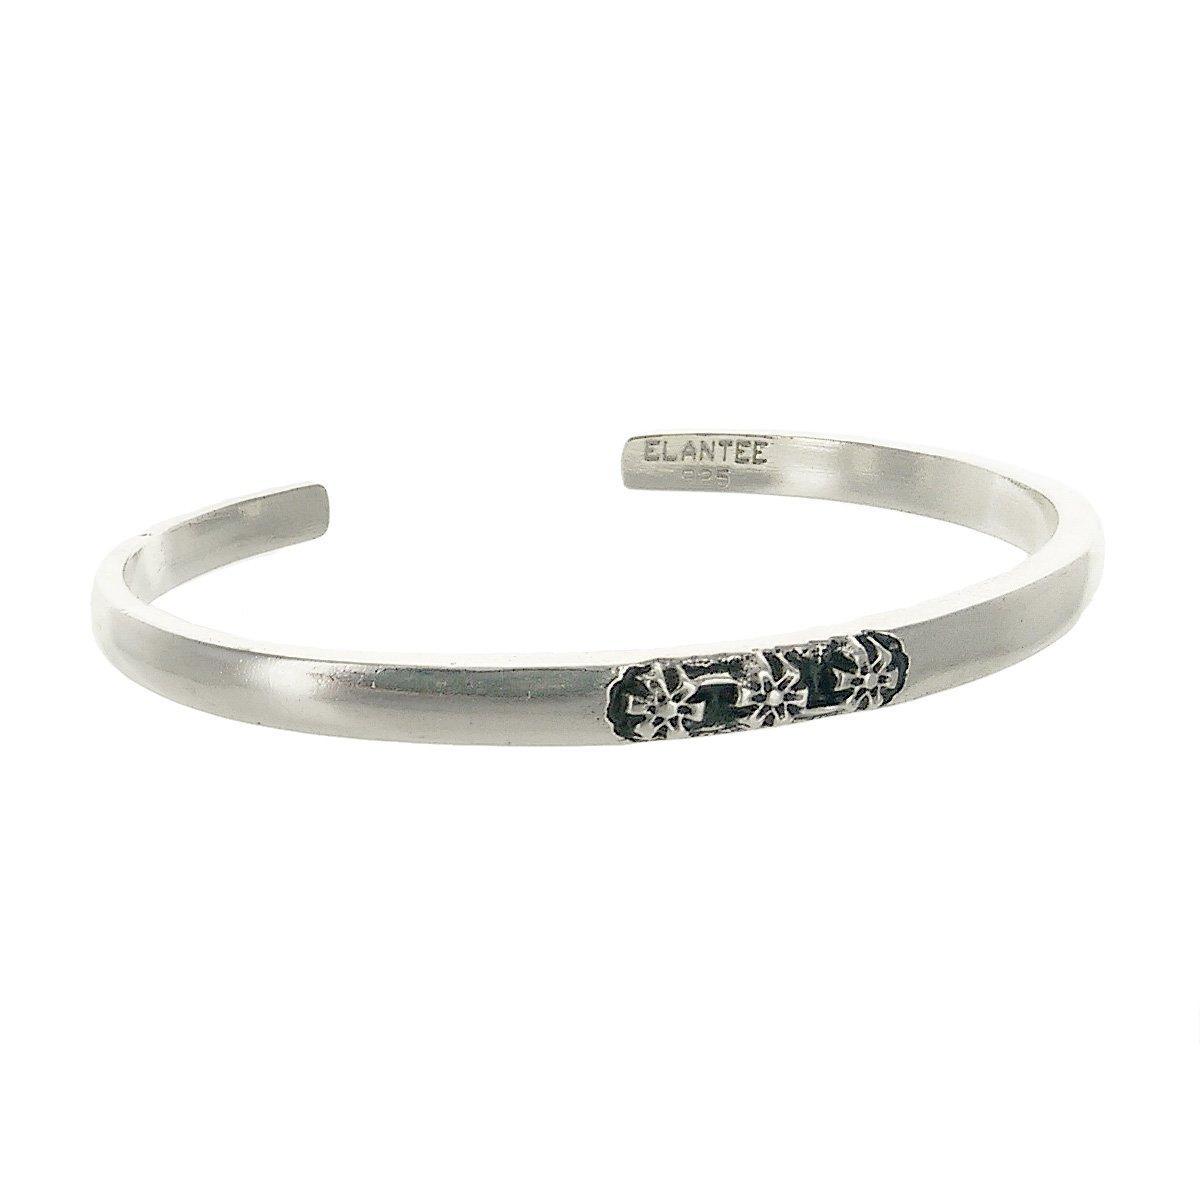 Sterling Silver You Are Appreciated Cuff Bracelet 5oz 2.5'' dia by Elantee